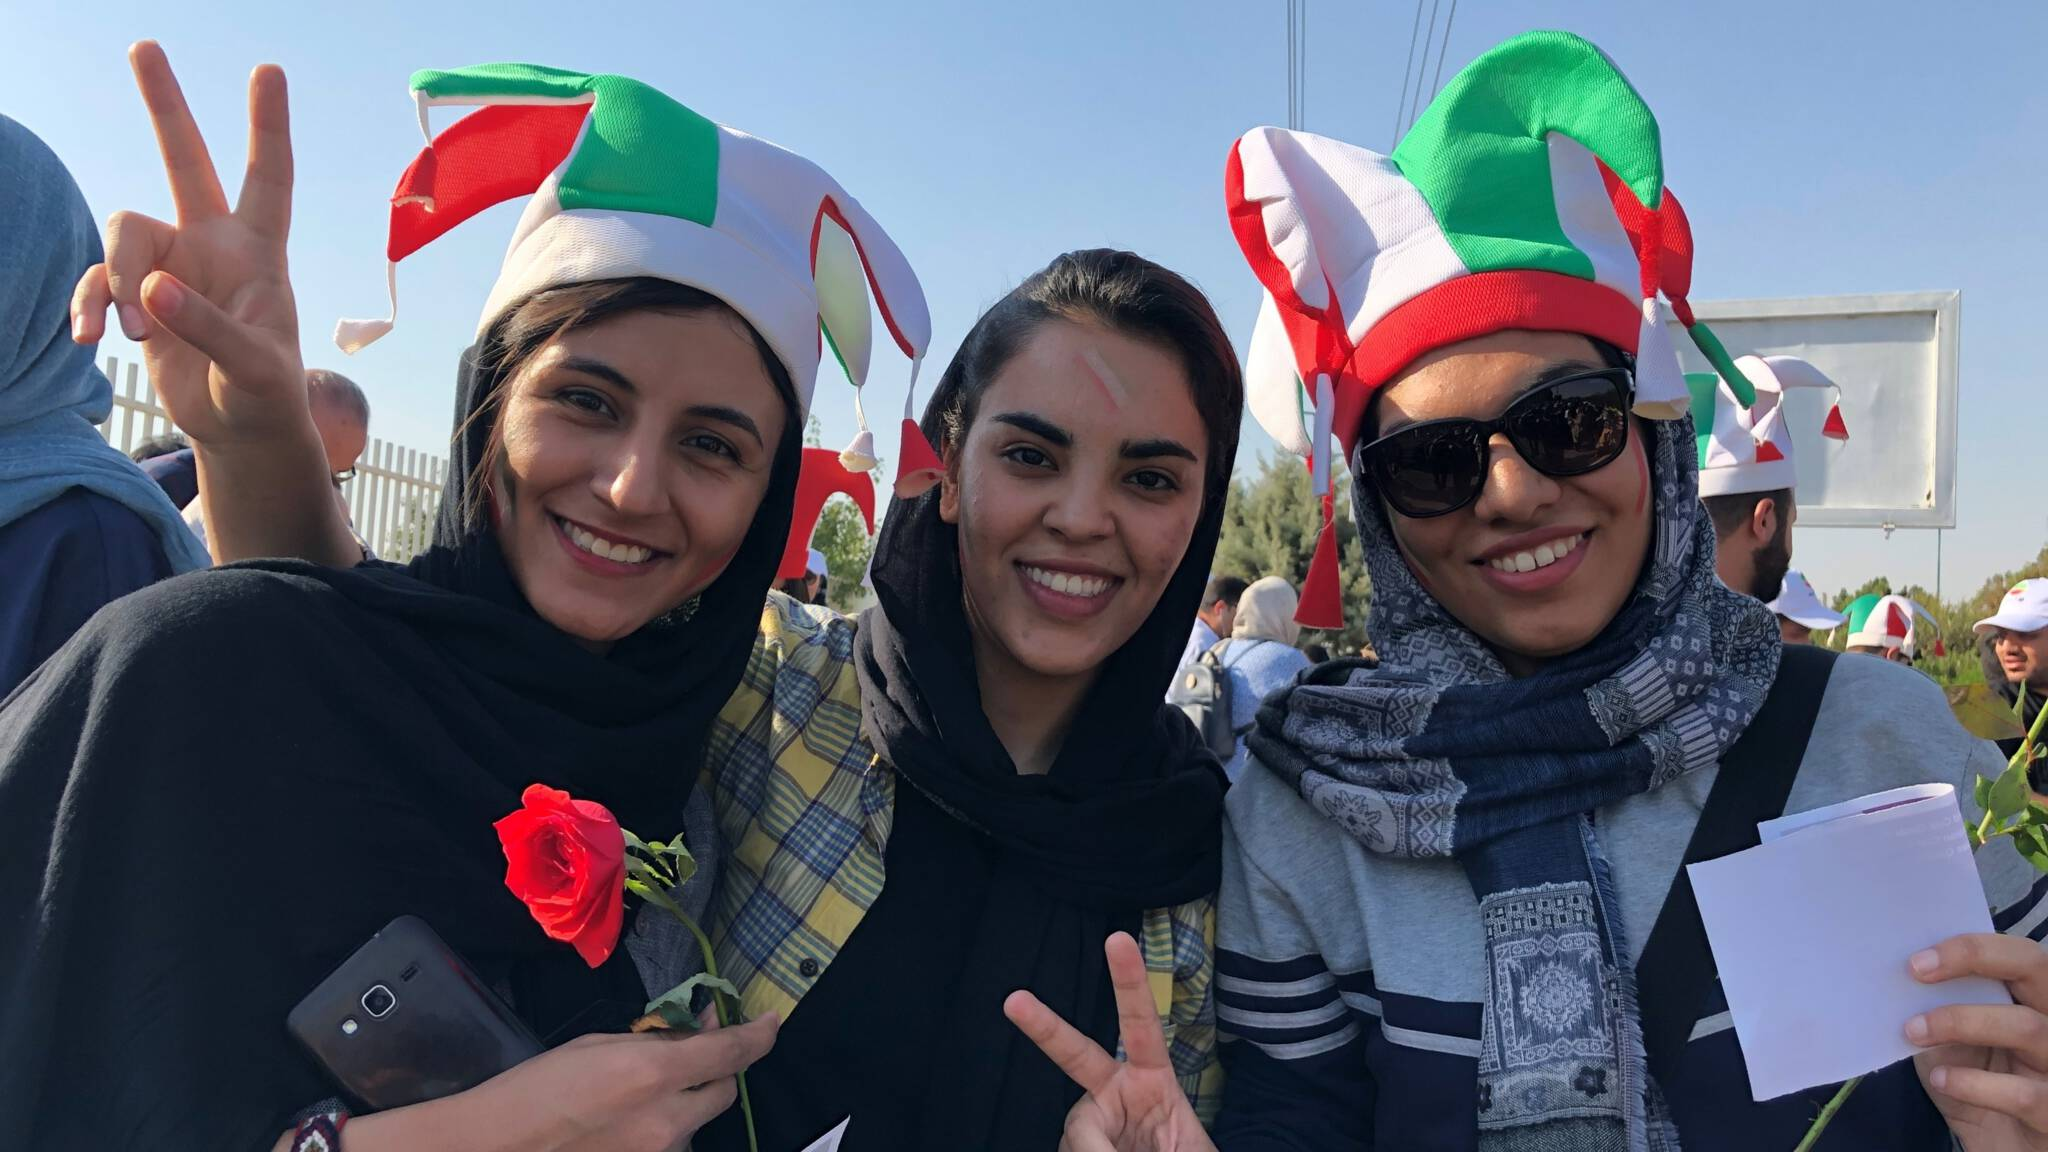 Iranian women fans in the stadium, photo by NOS / Marcel van der Steen